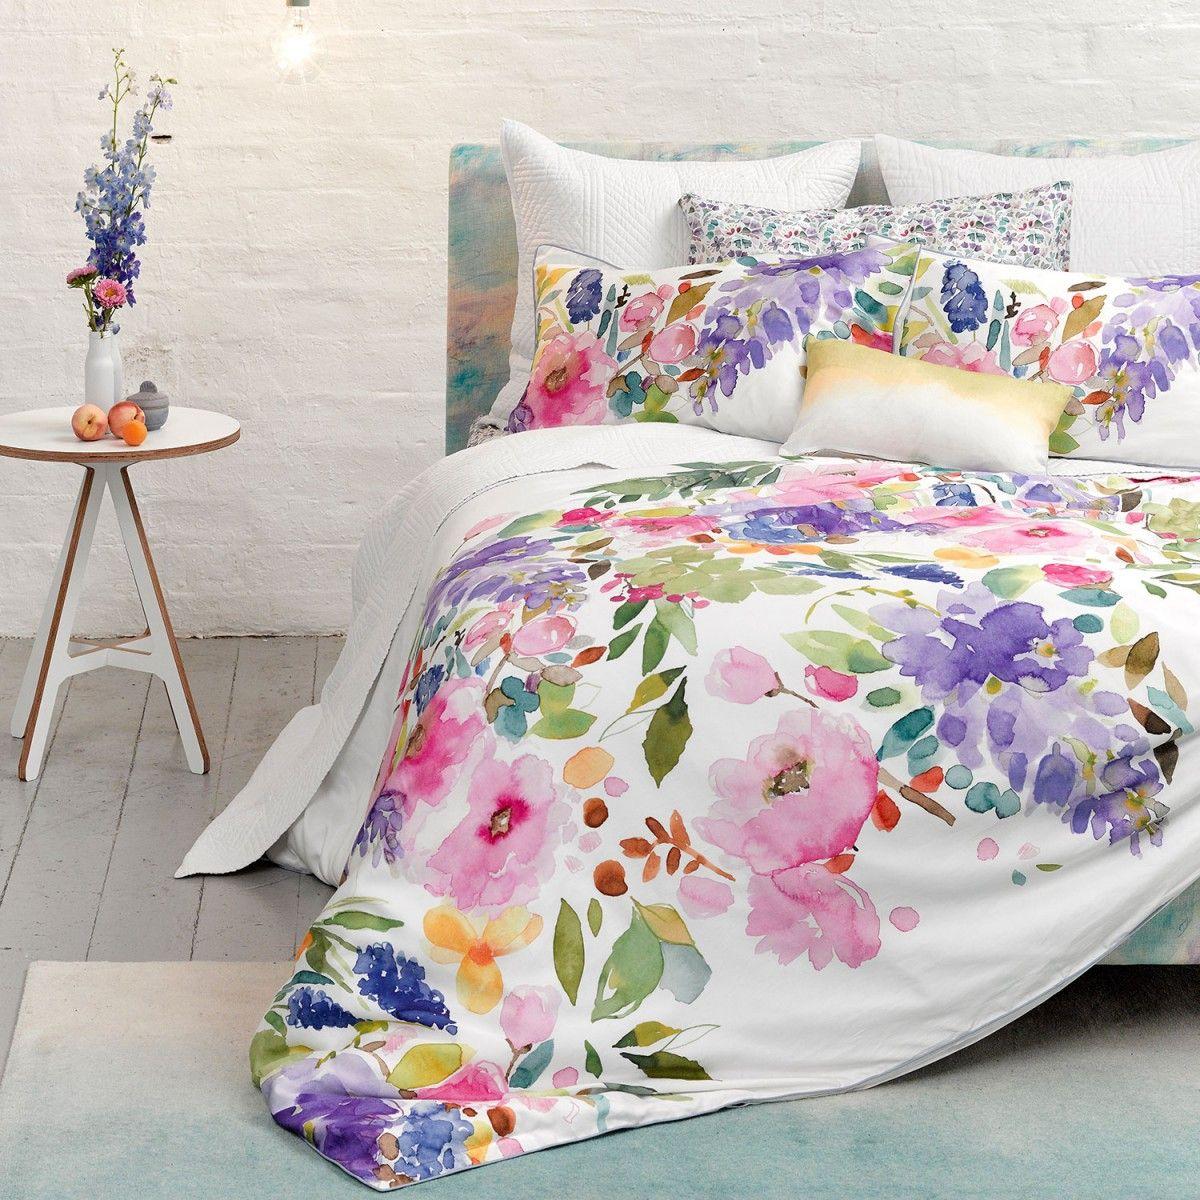 Floral bedding tumblr - Wisteria Duvet Floral Watercolour Bedding Bluebellgray